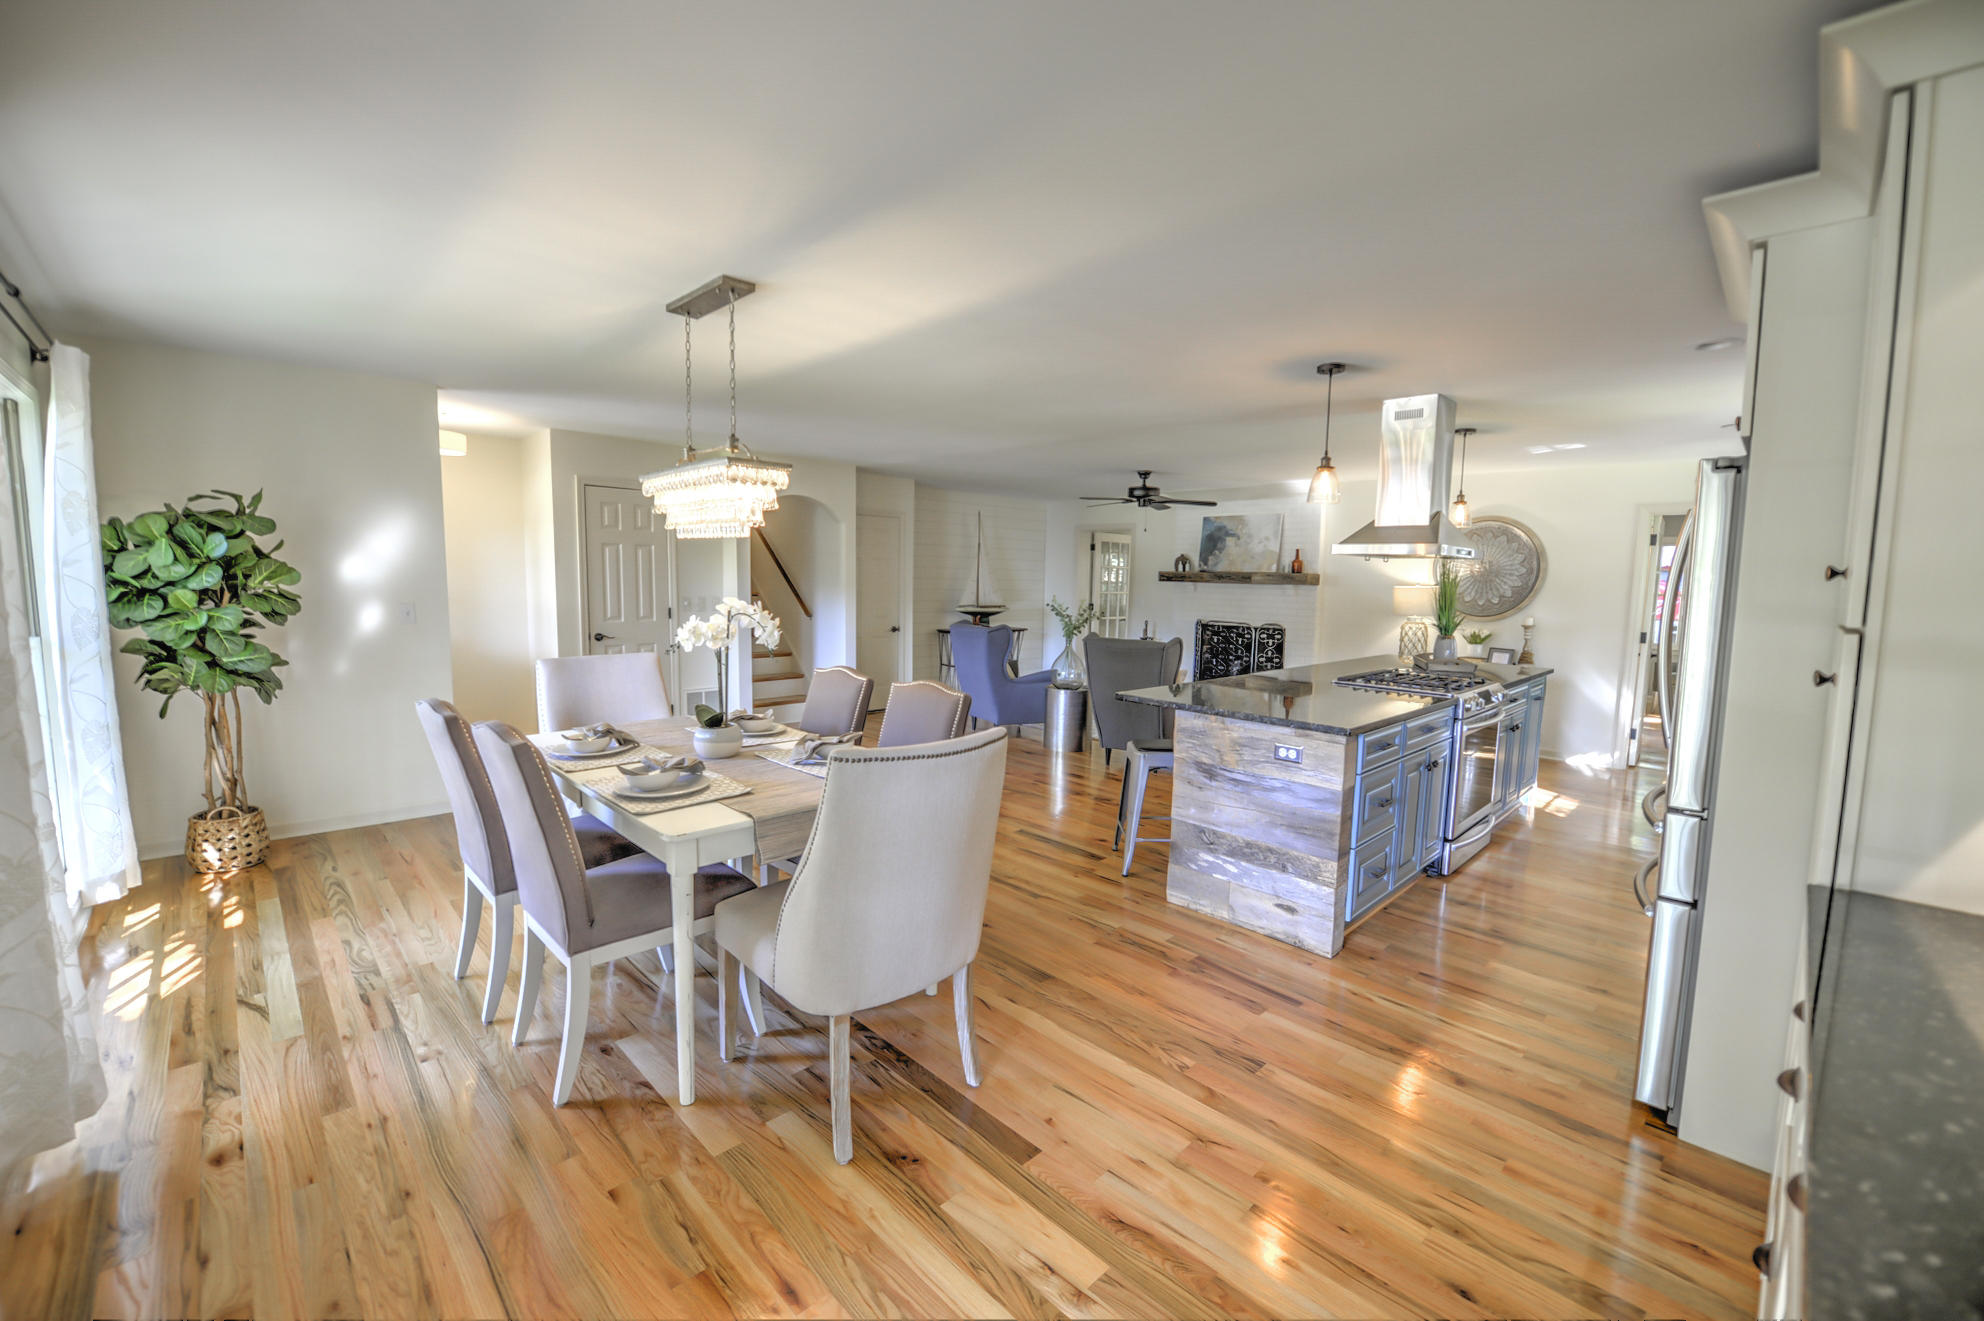 Shemwood II Homes For Sale - 1017 Jack Snipe, Mount Pleasant, SC - 30